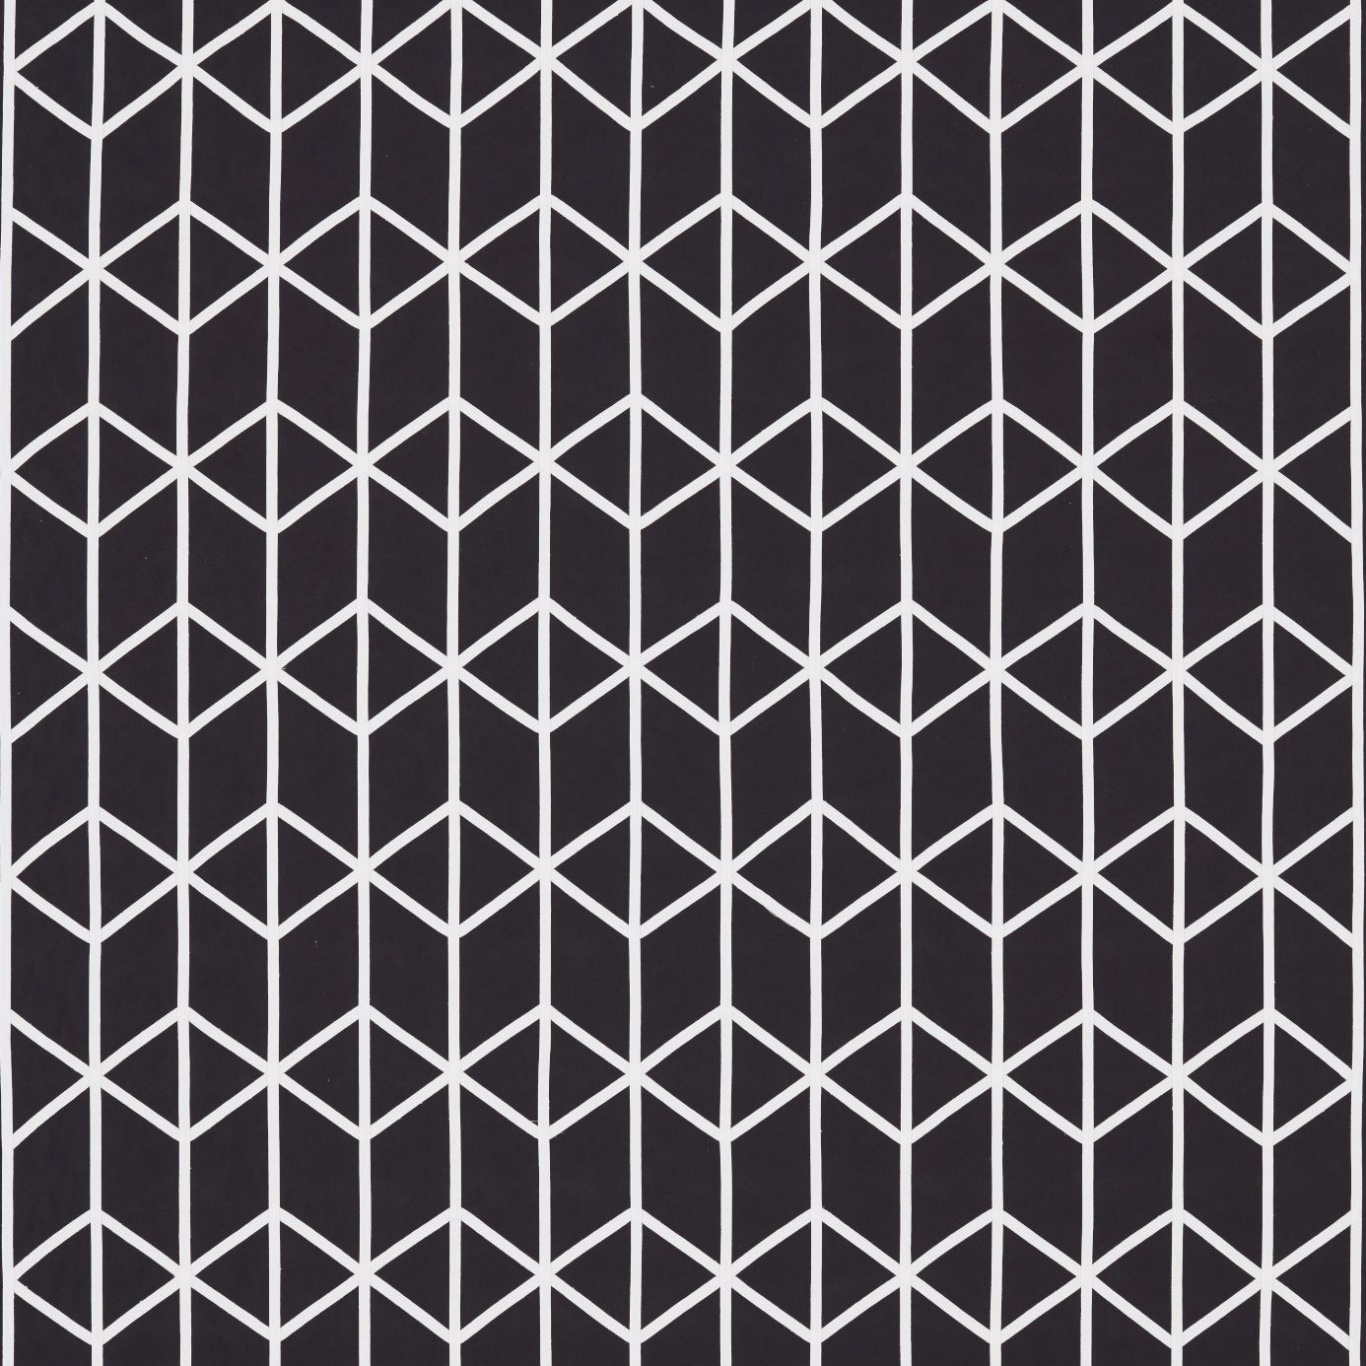 Image of Scion Nendo Liquorice Curtain Fabric 131820